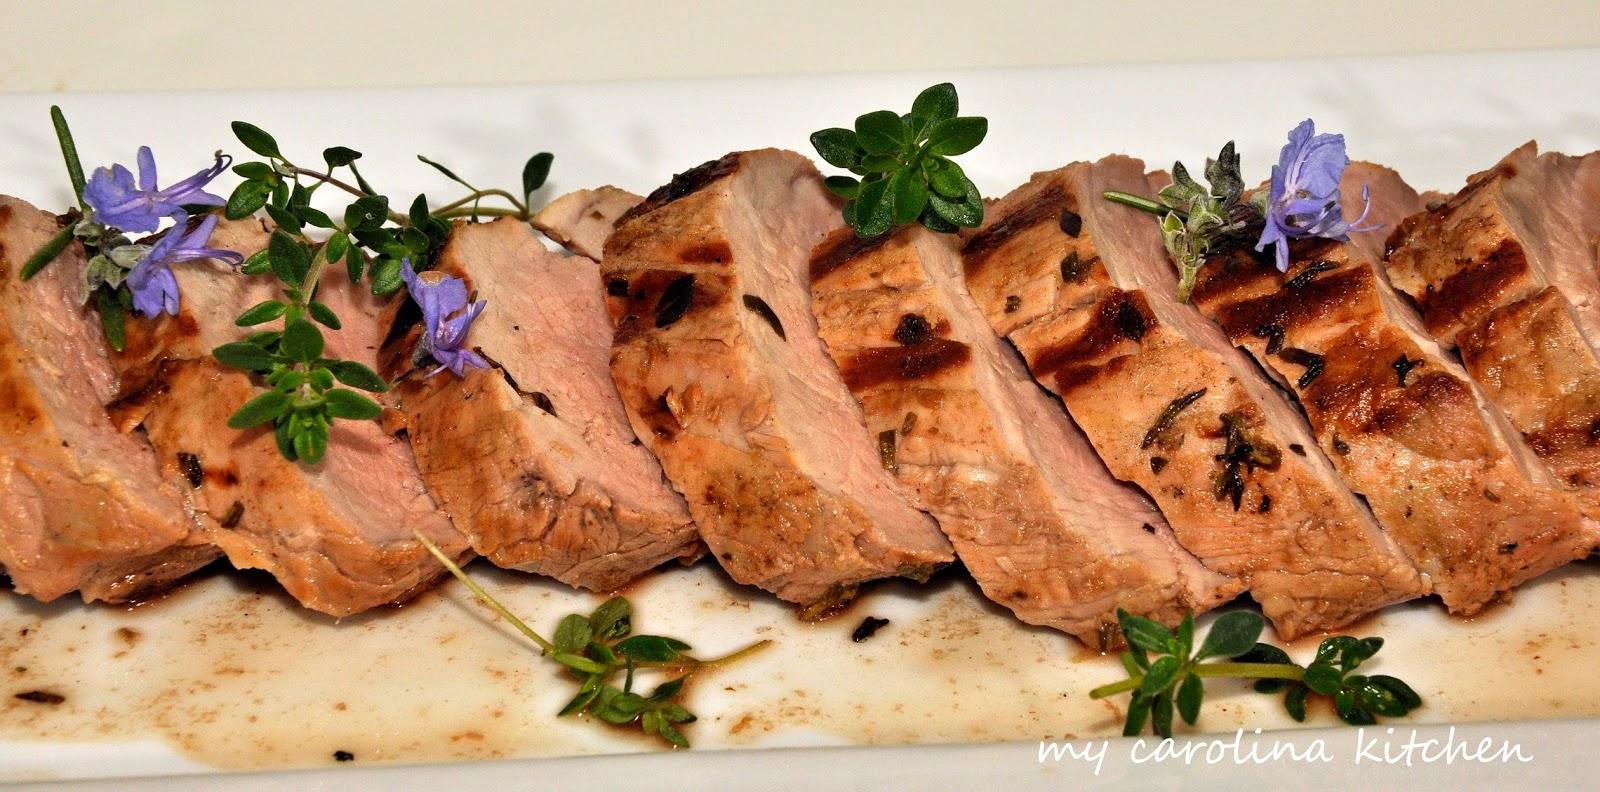 my carolina kitchen herb marinated pork tenderloin with a greek